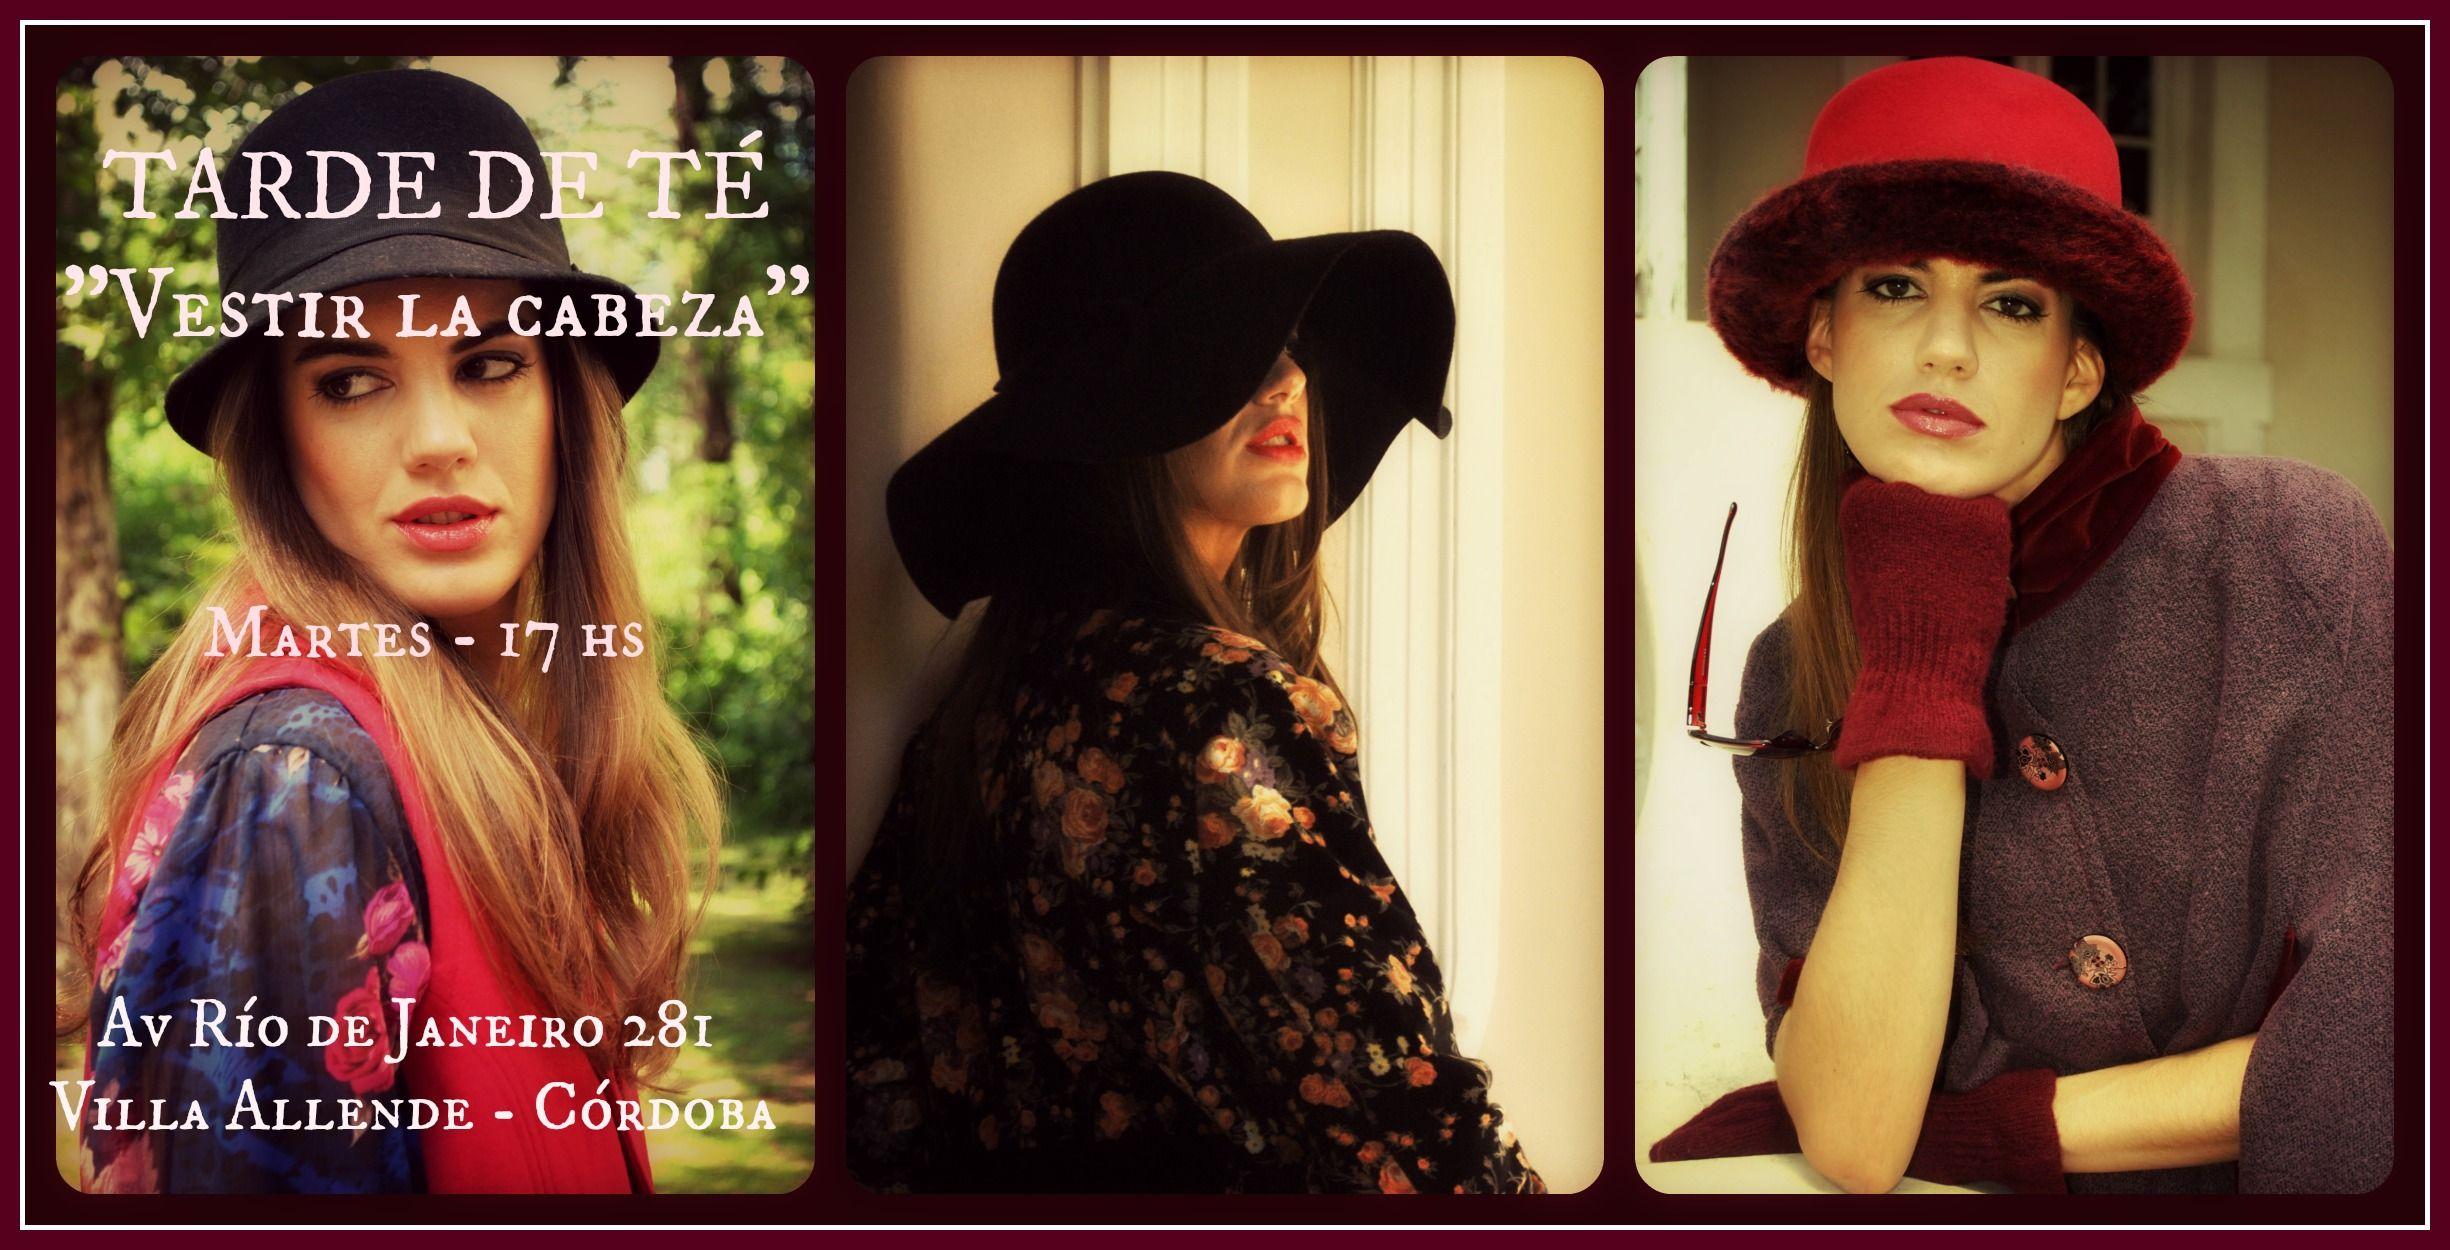 #tardesdete #sombreros #invierno2014